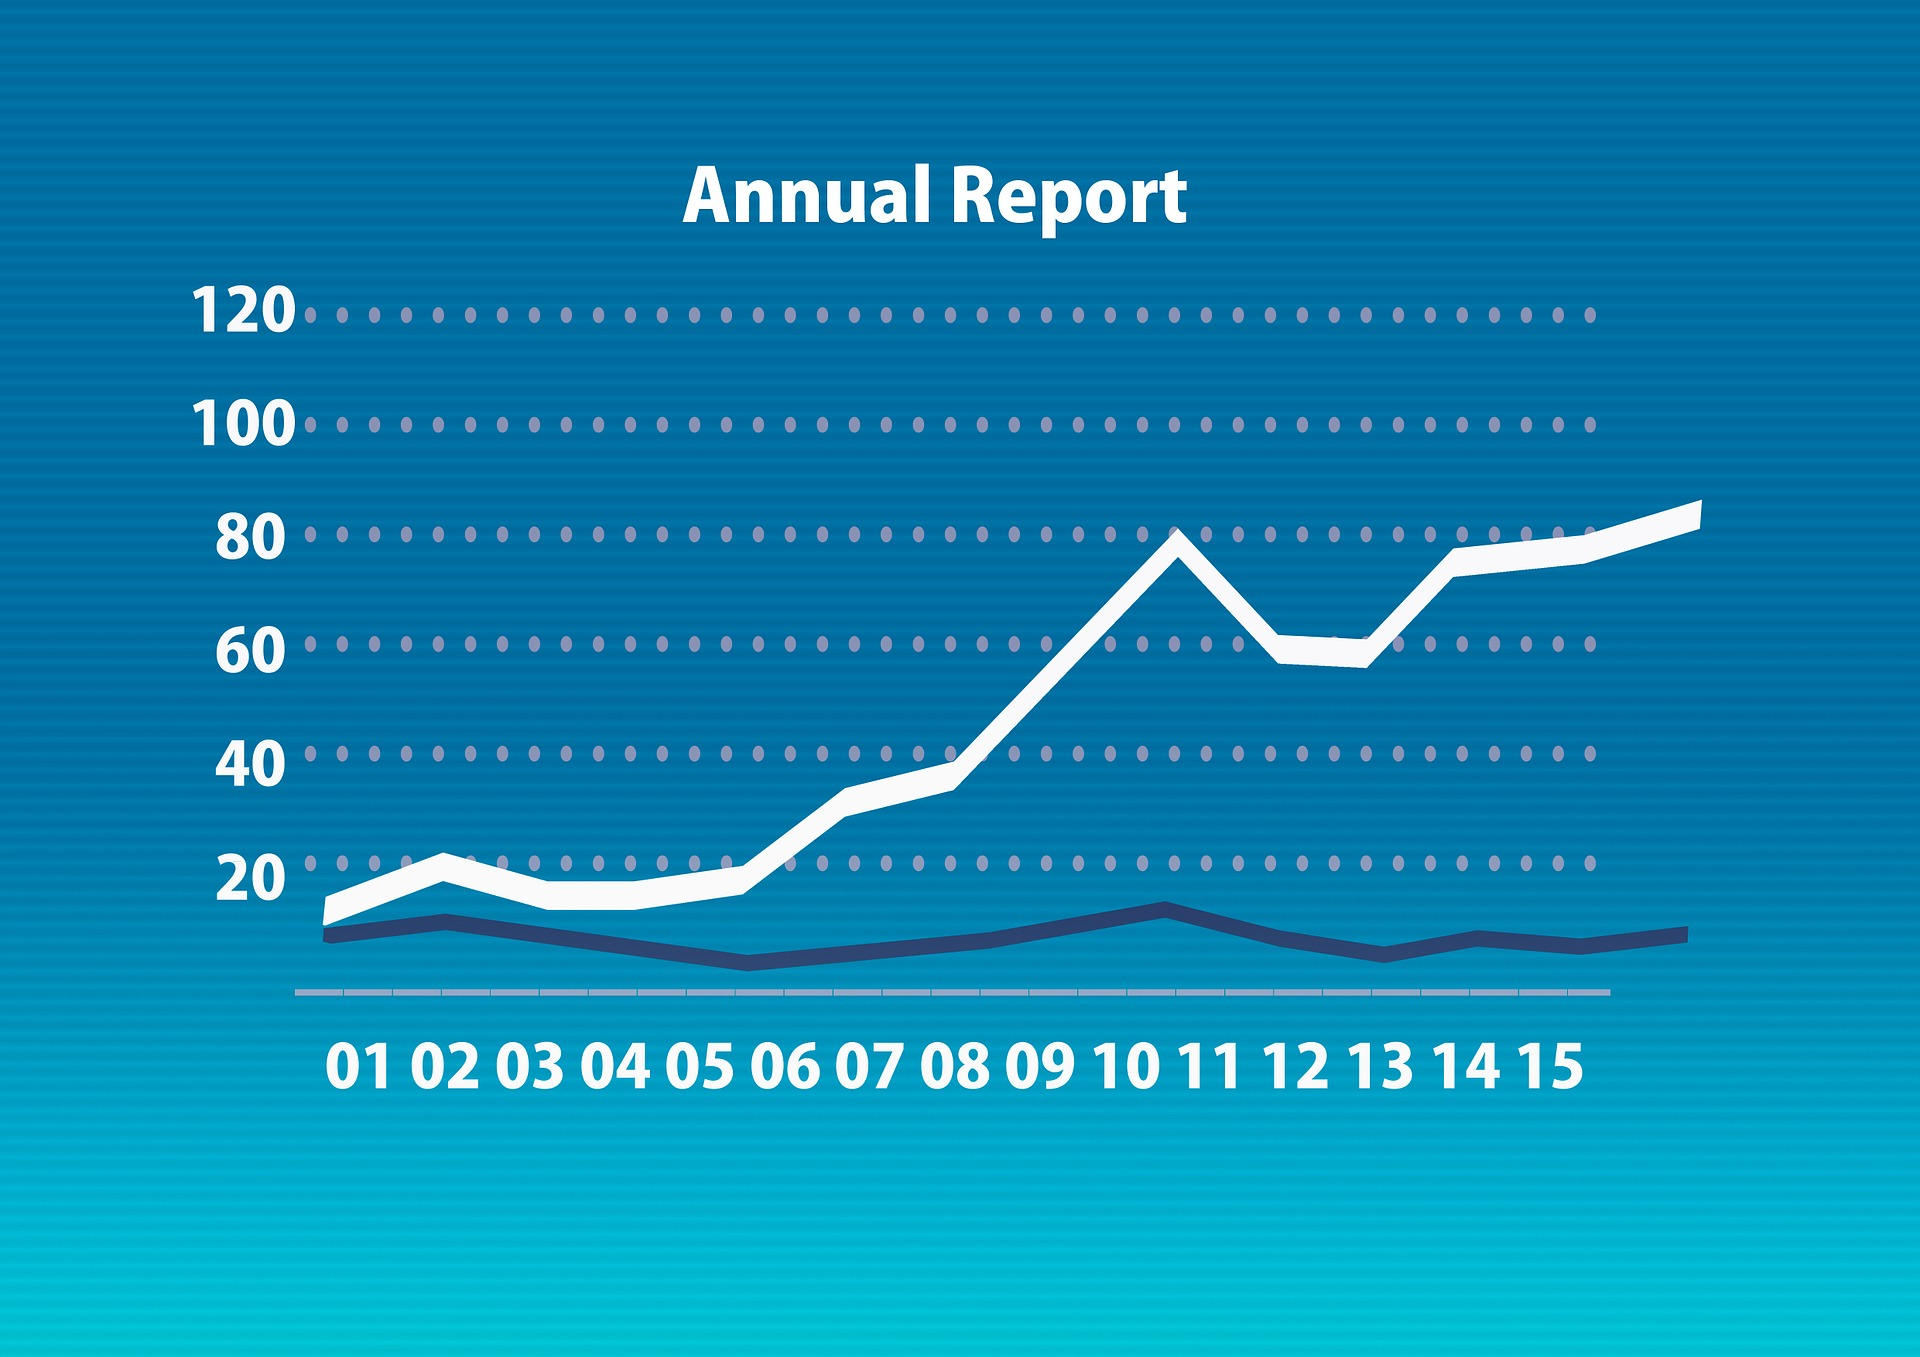 annual-report-816488_1920